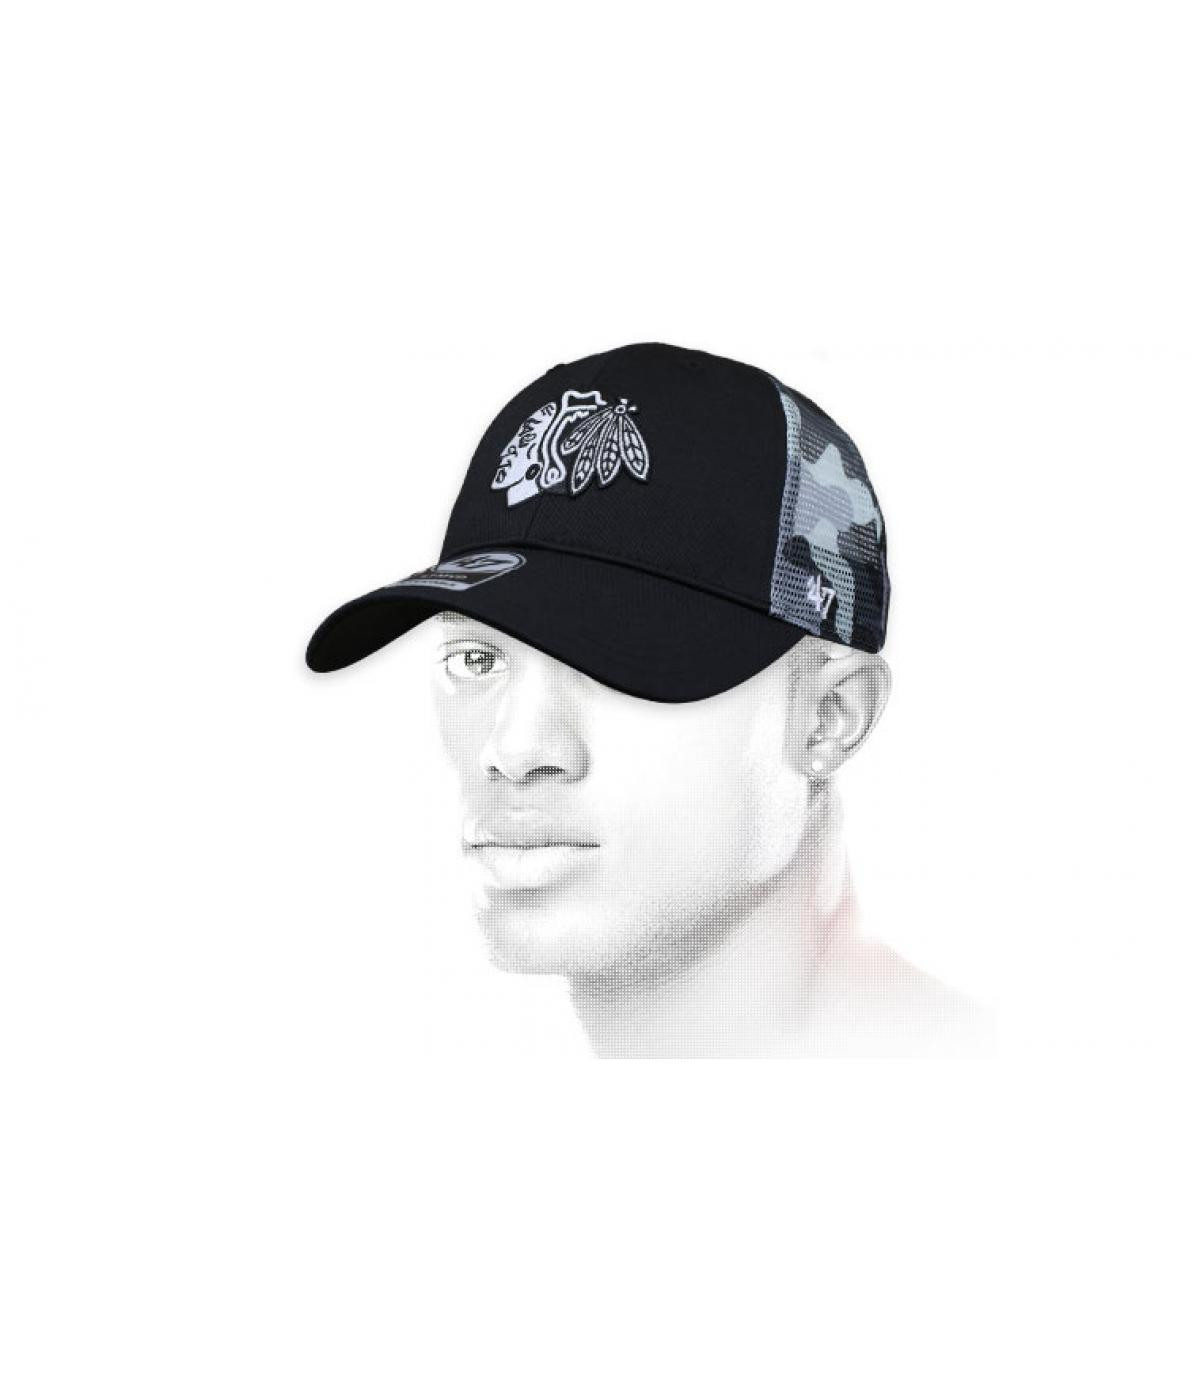 Cap Blackhawks schwarz camo